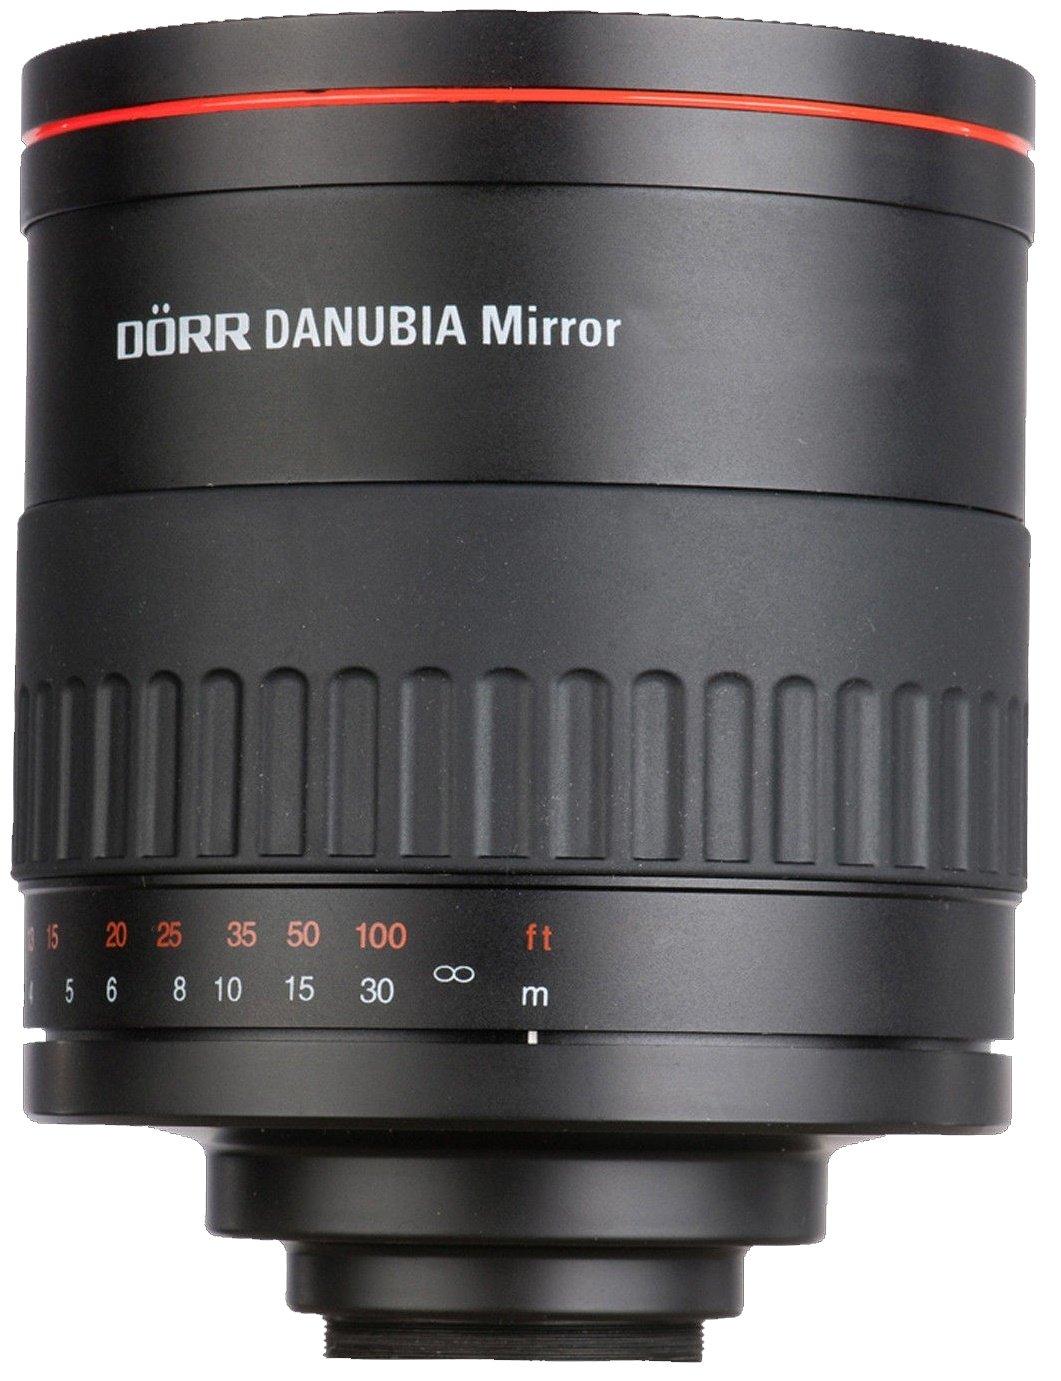 STARLENS 500 mm f/6,3 Mirror MC pro Olympus/Panasonic MFT